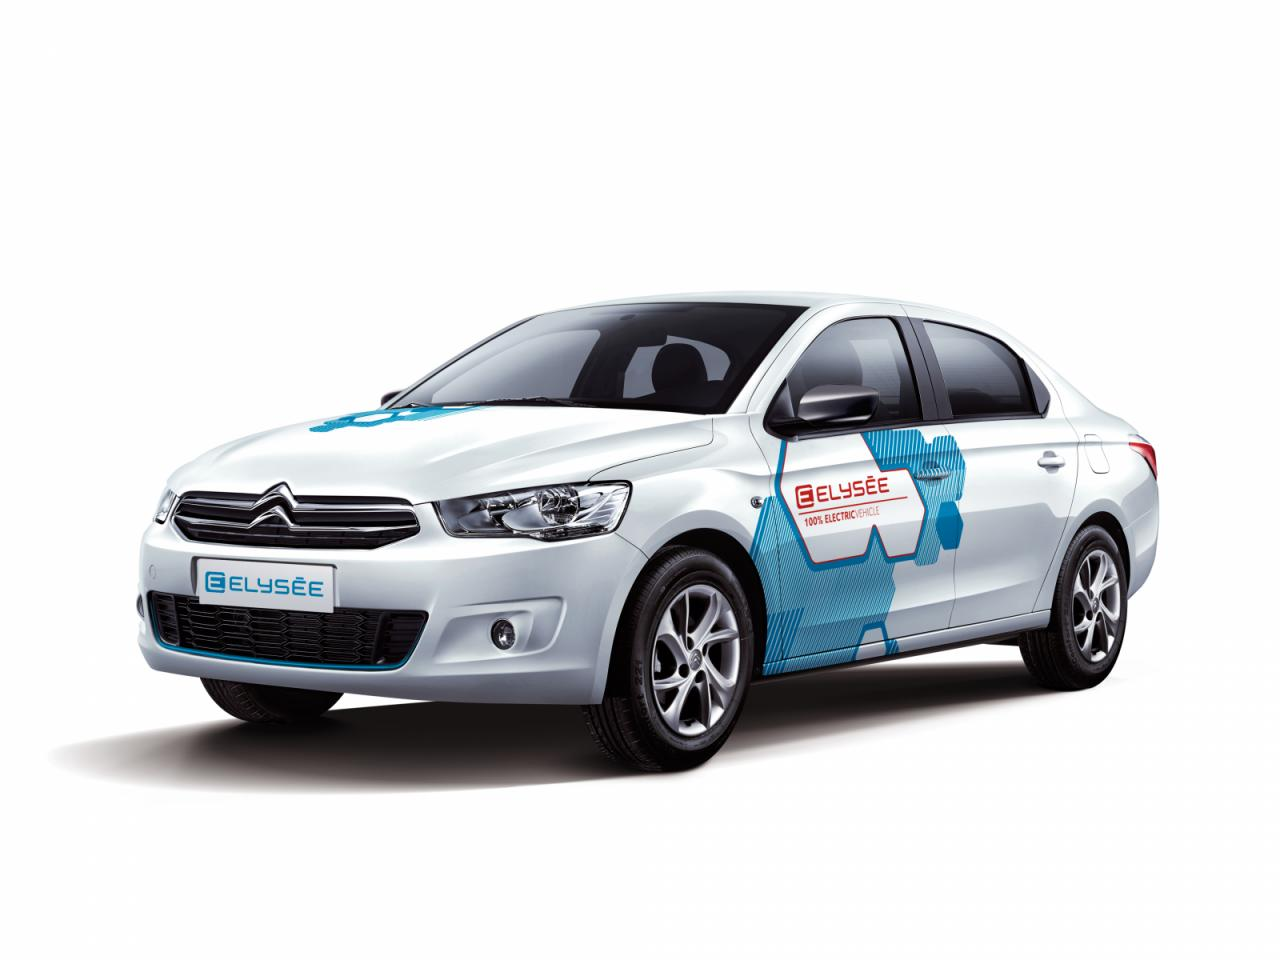 Седан Citroën C-Elysee стал серийным электромобилем